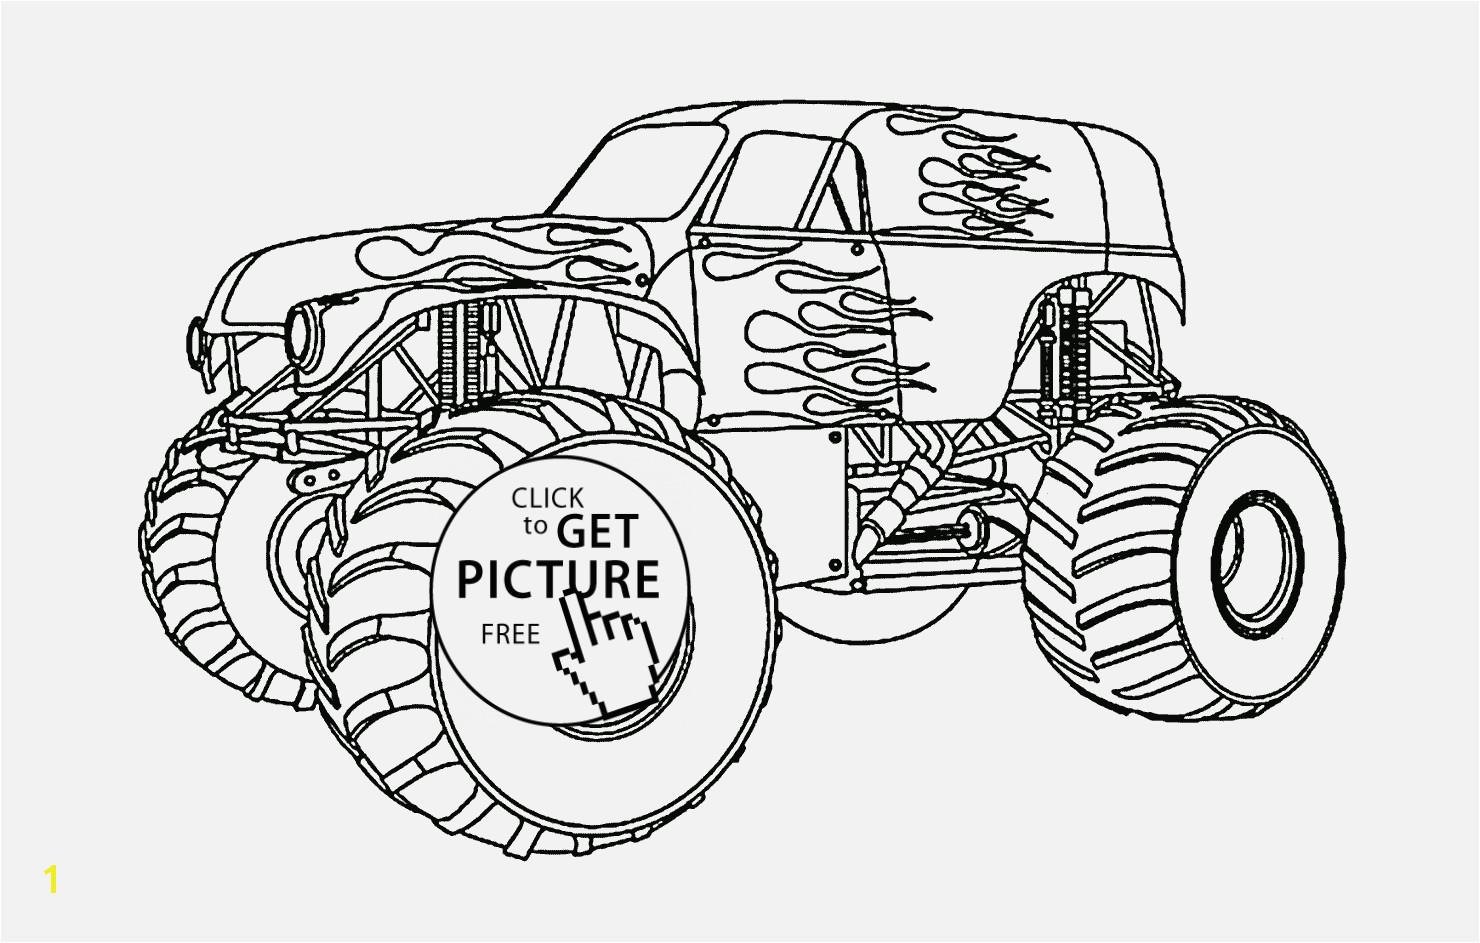 Monster Truck Coloring Pages Verschiedene Bilder Färben Printable Macqueen Monster Truck Cars Coloring Page for Kids